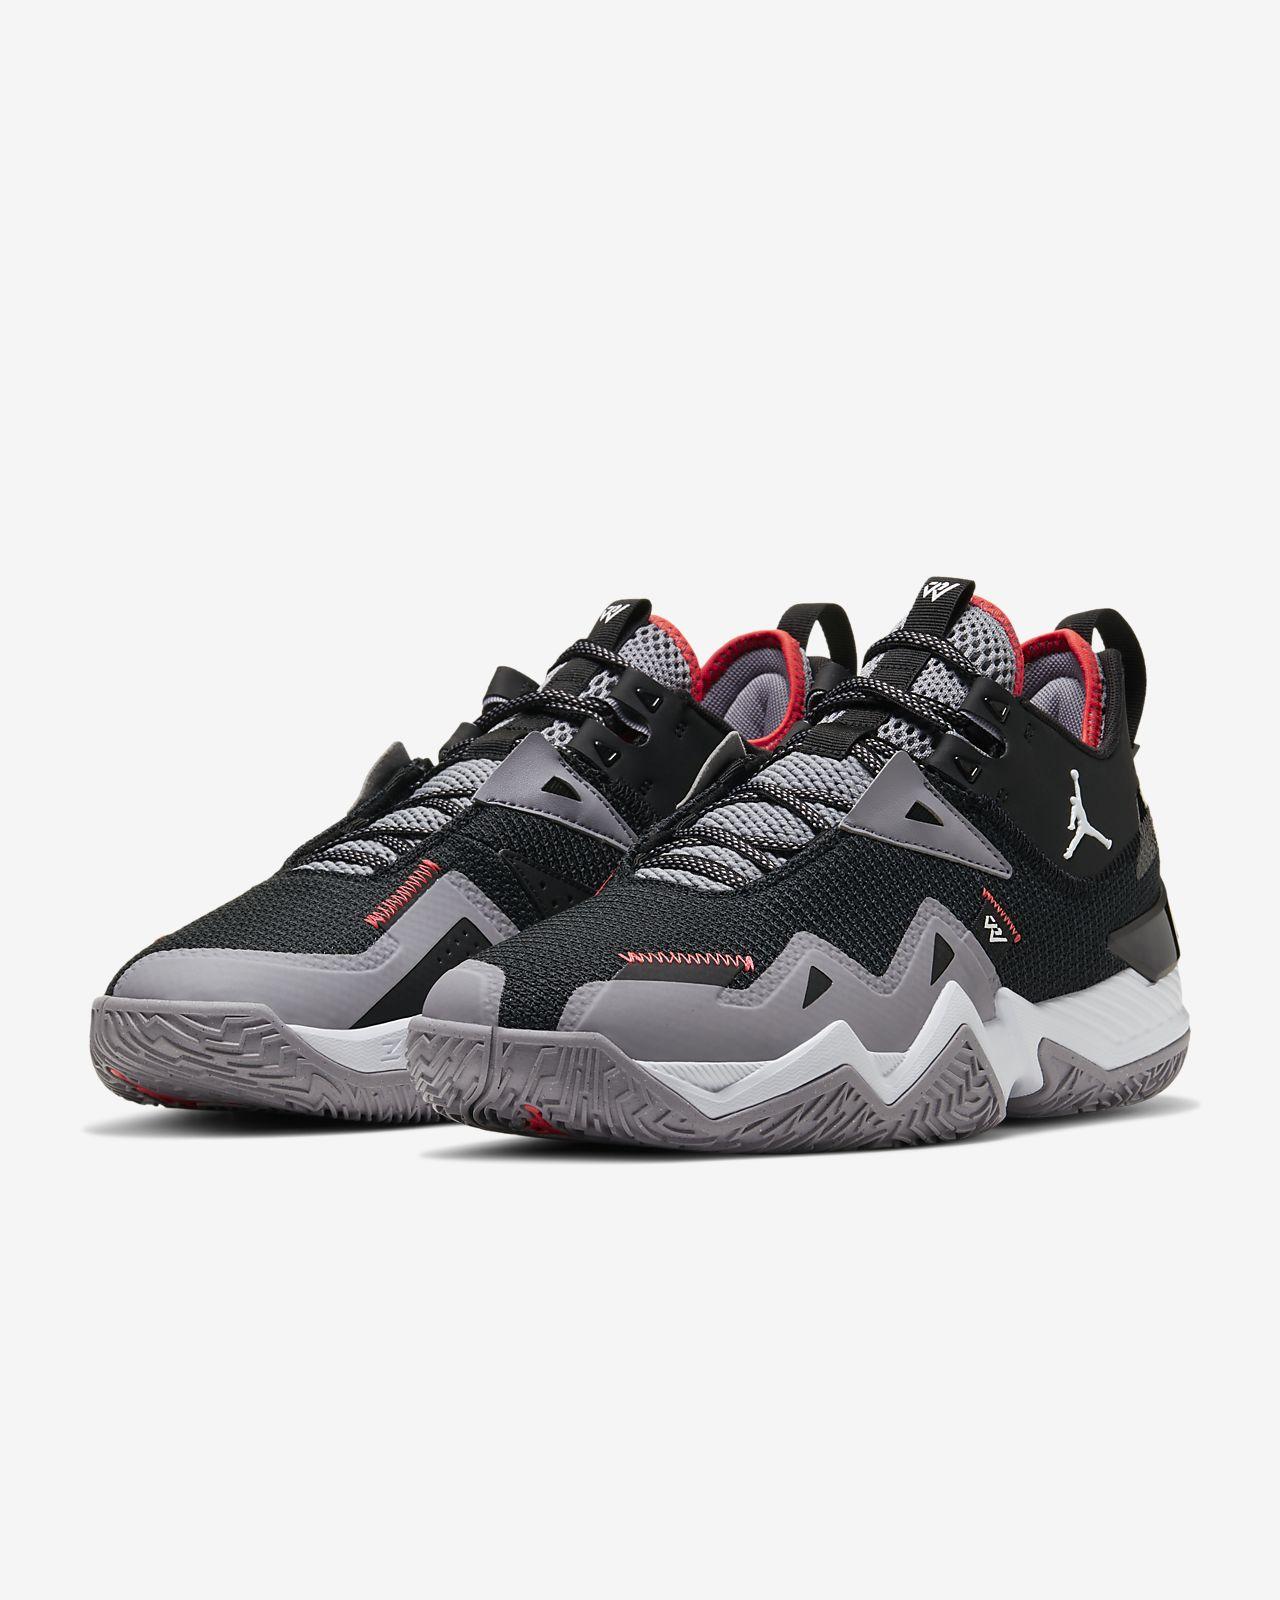 Chaussure de basketball Jordan Westbrook One Take